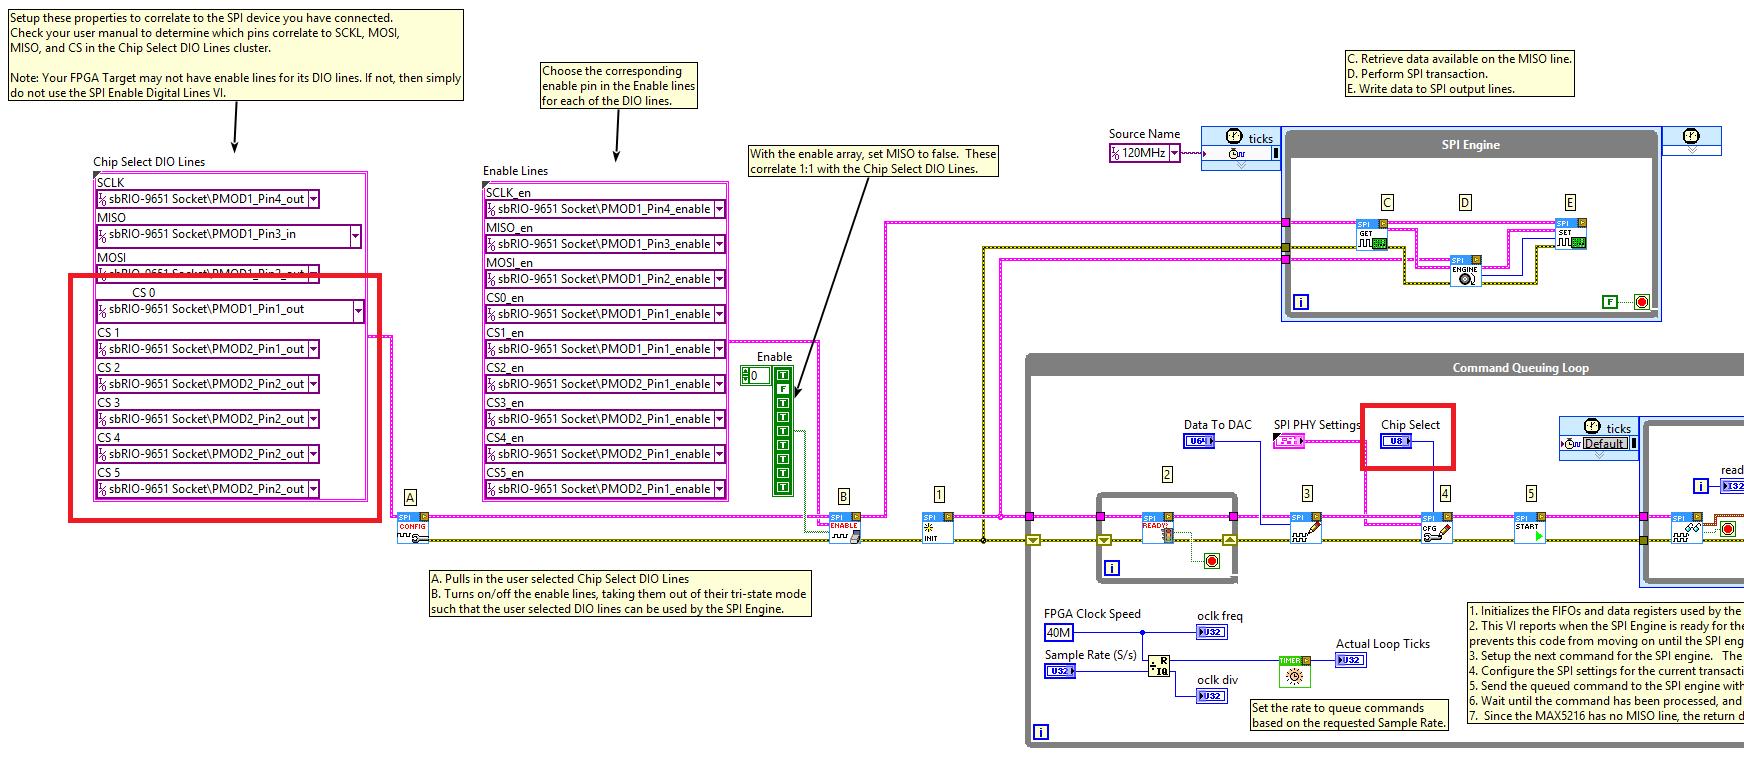 Integrating Digilent pmods with sbRIO-9651 - NI Community